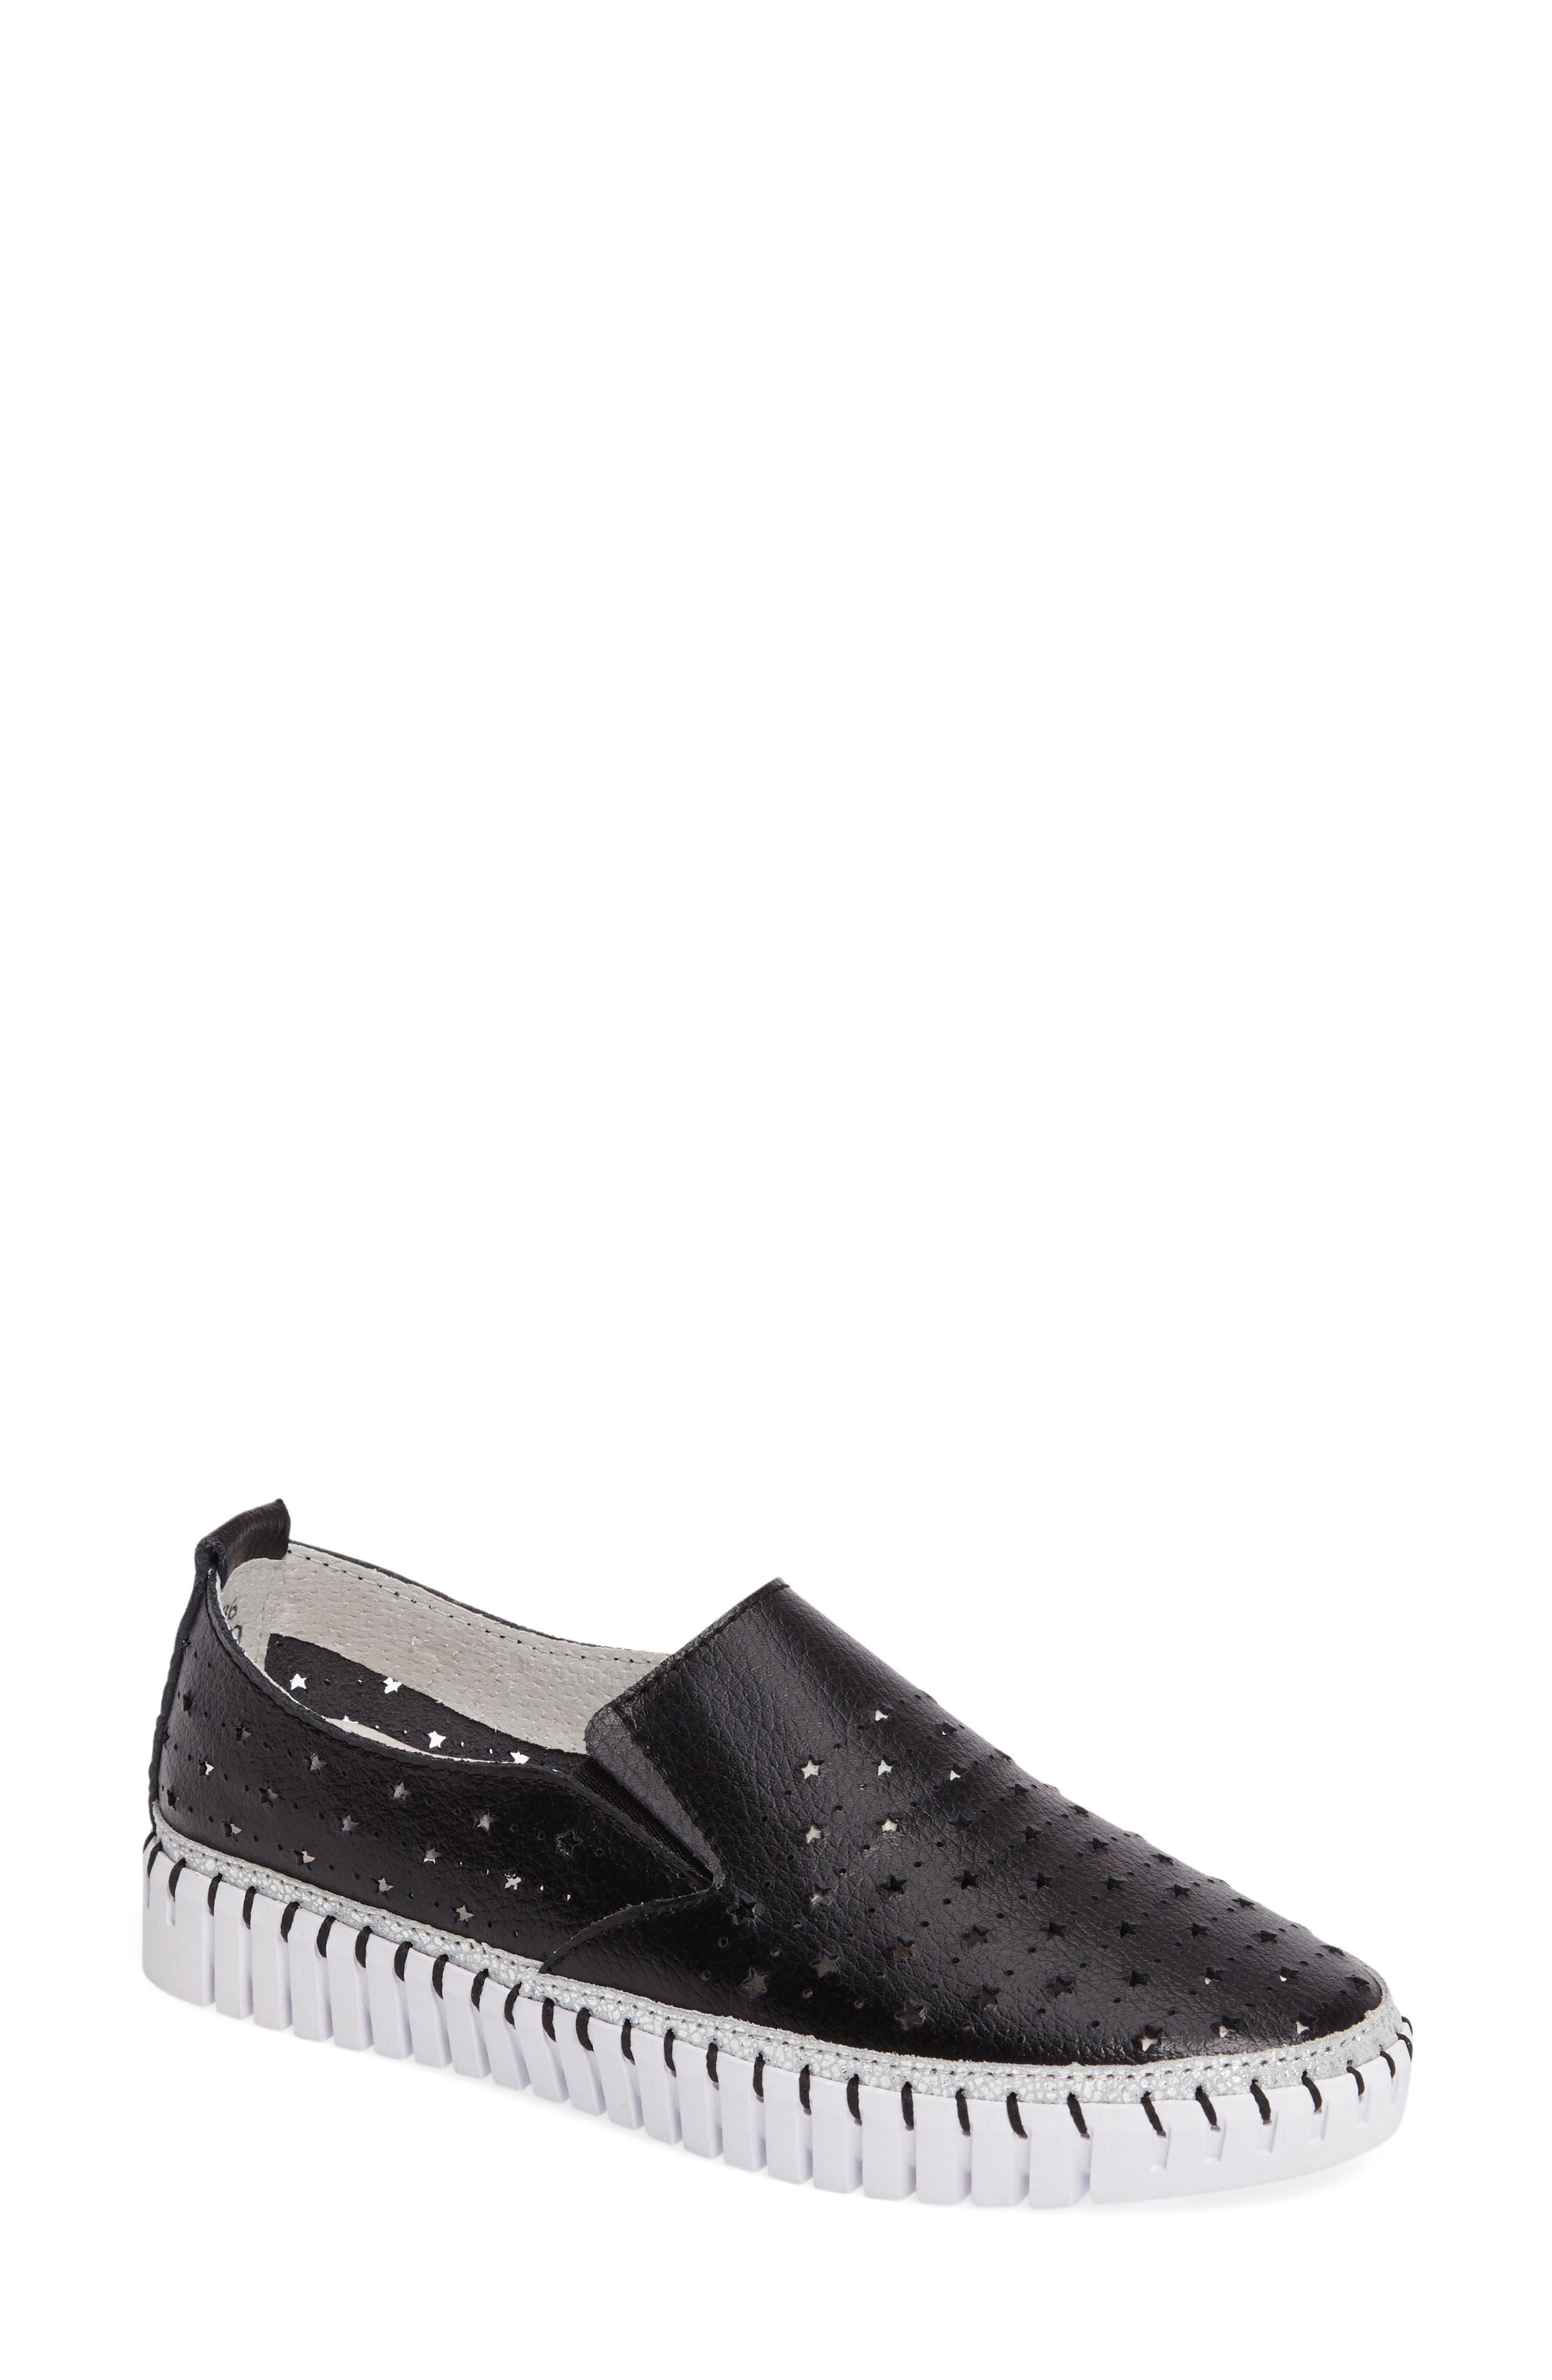 TW40 Slip-On Sneaker,                         Main,                         color, BLACK LEATHER